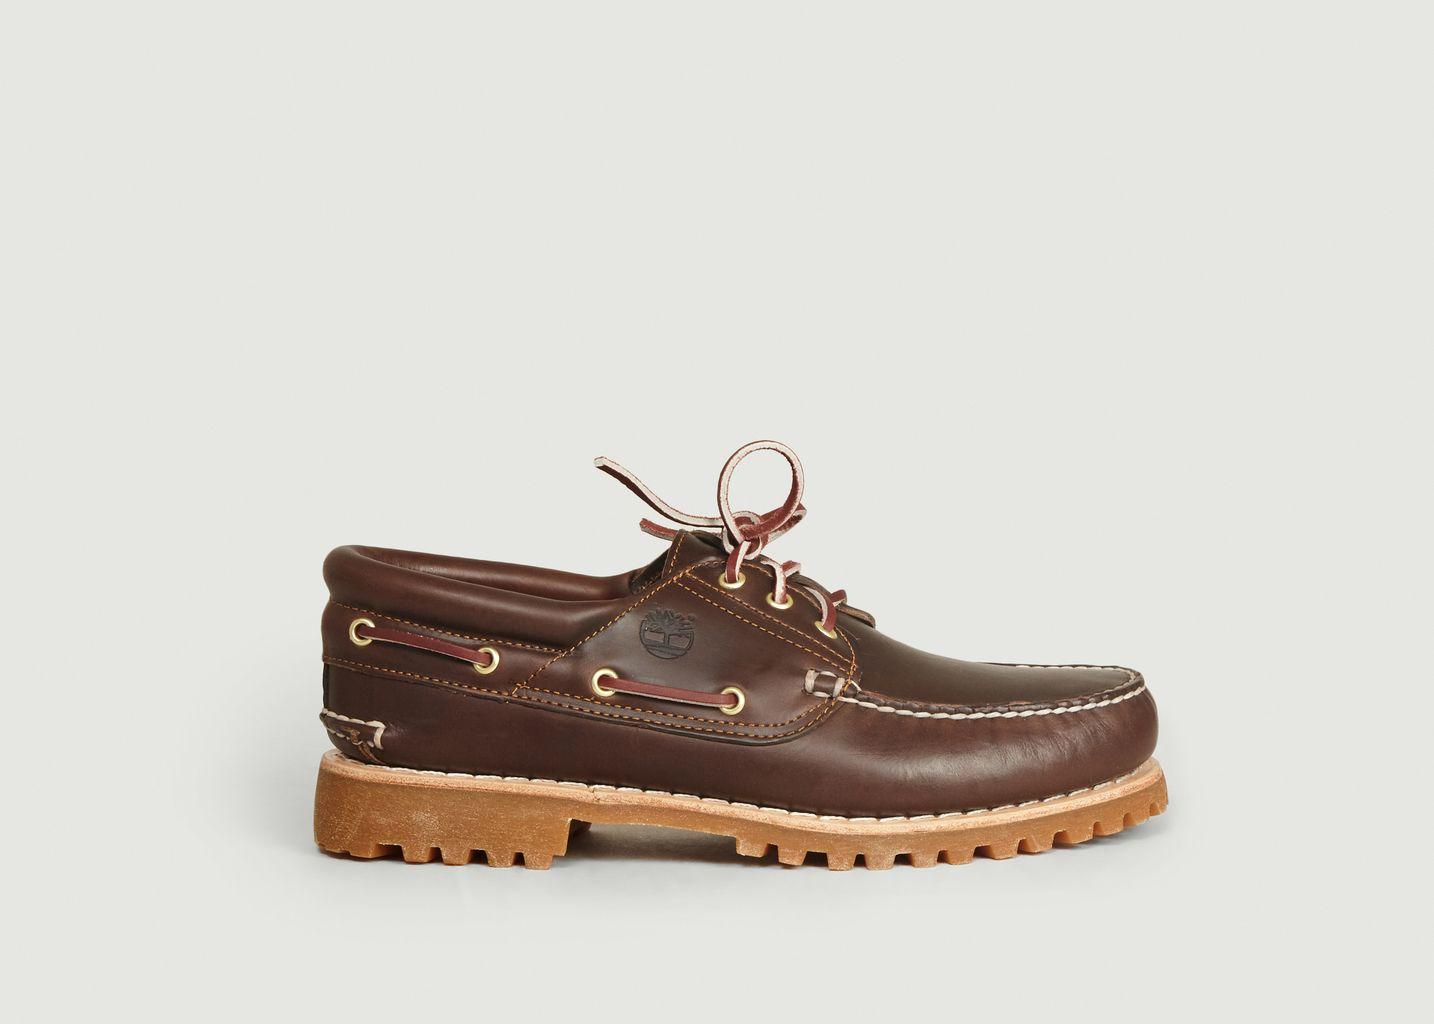 Chaussures bateau Authentics 3 Eye Classic Lug - Timberland